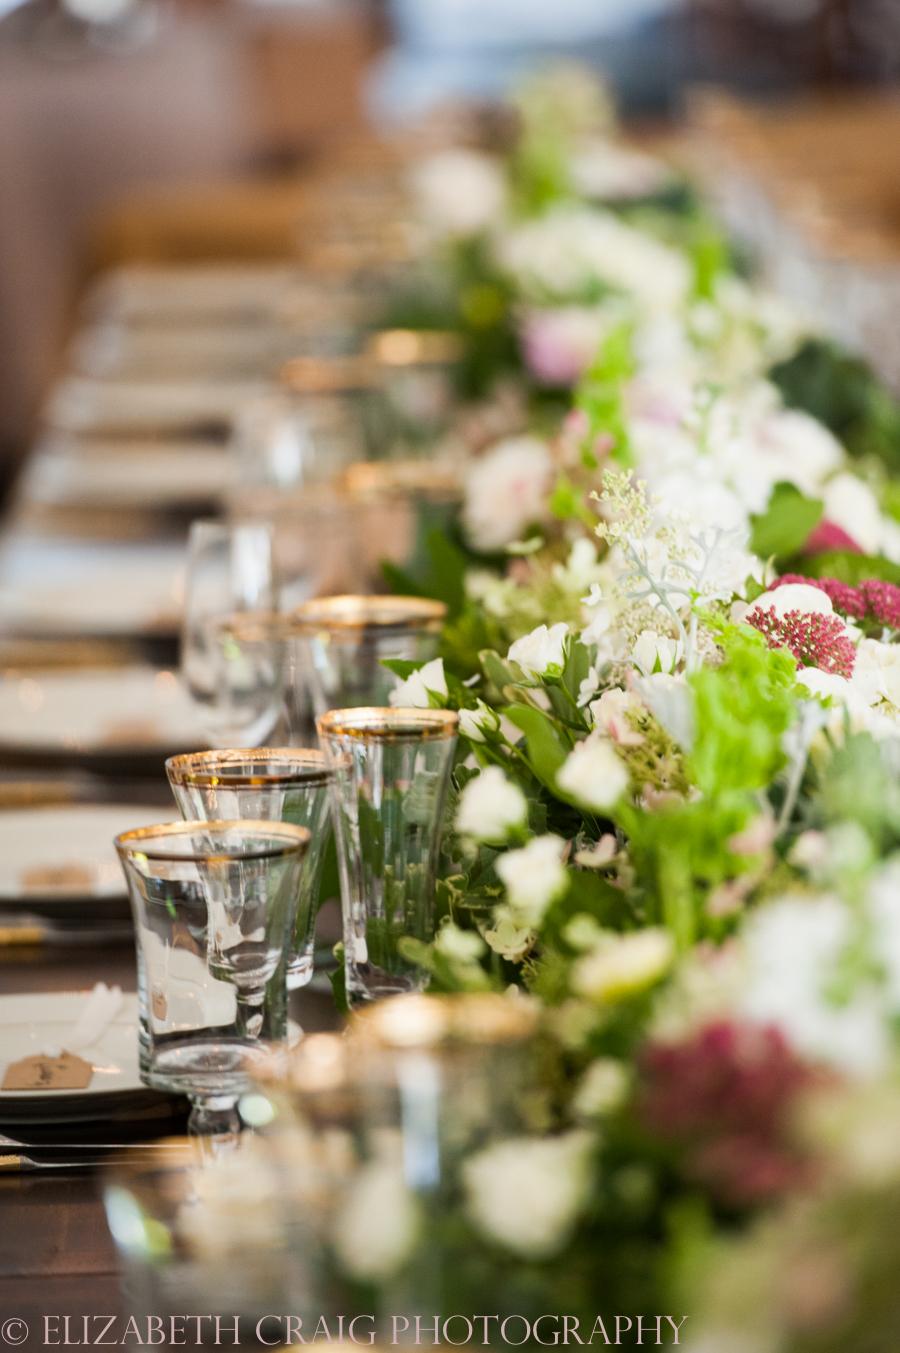 Dubois Brockway St. Marys PA Weddings-0158